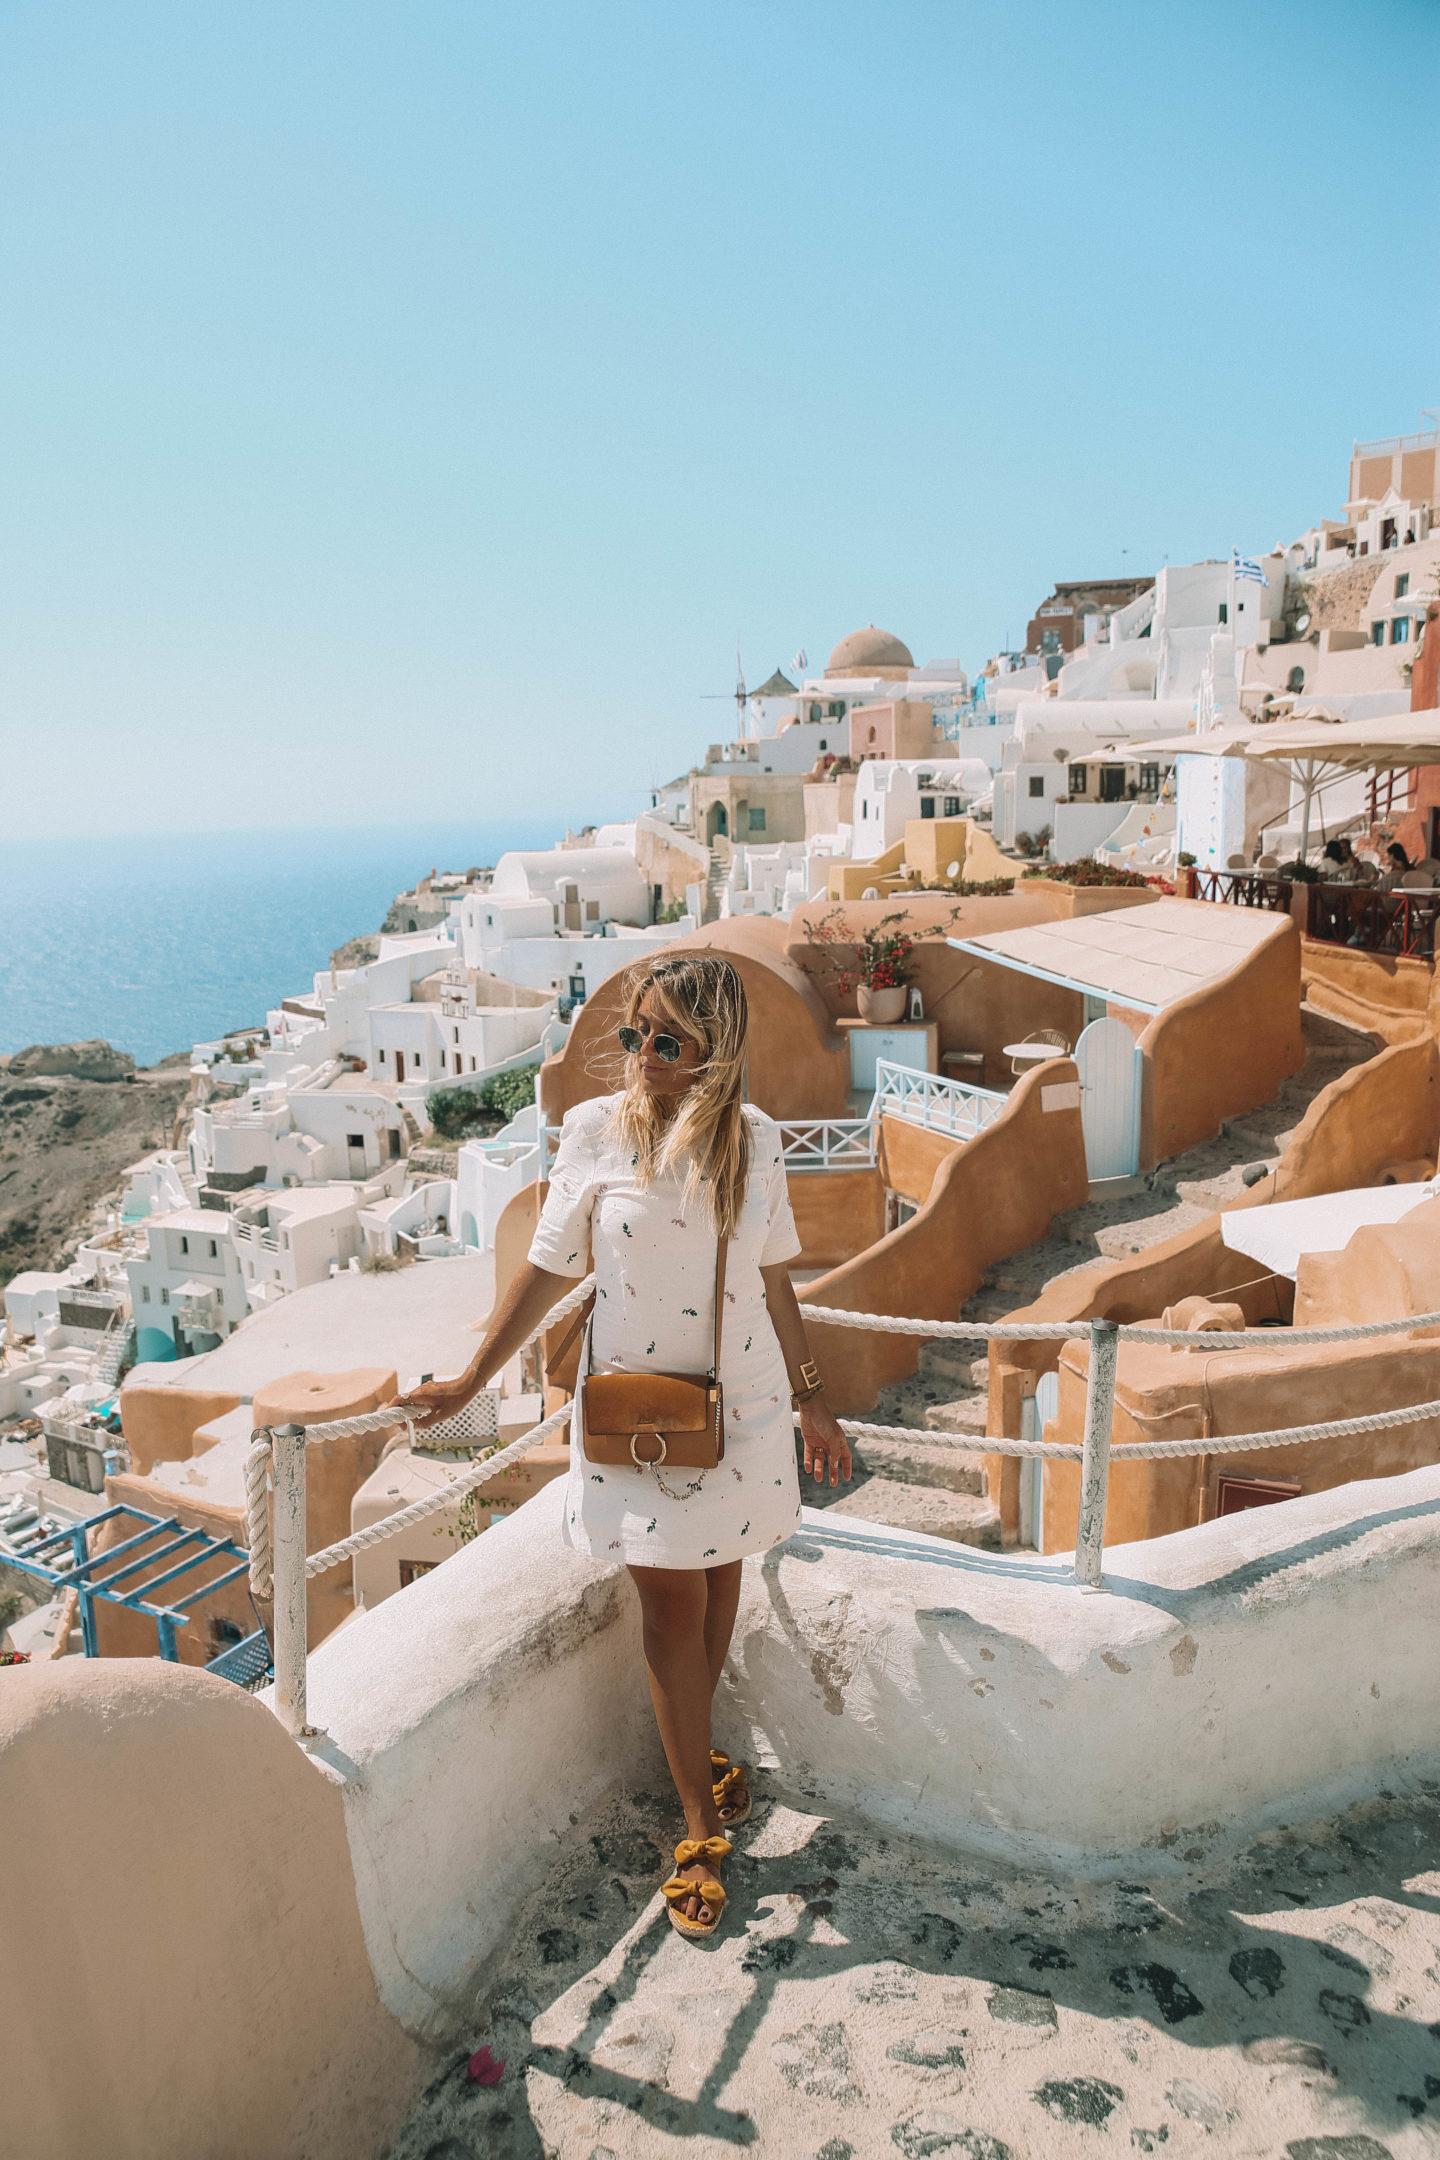 Visiter Santorin - Blondie Baby blog mode et voyages